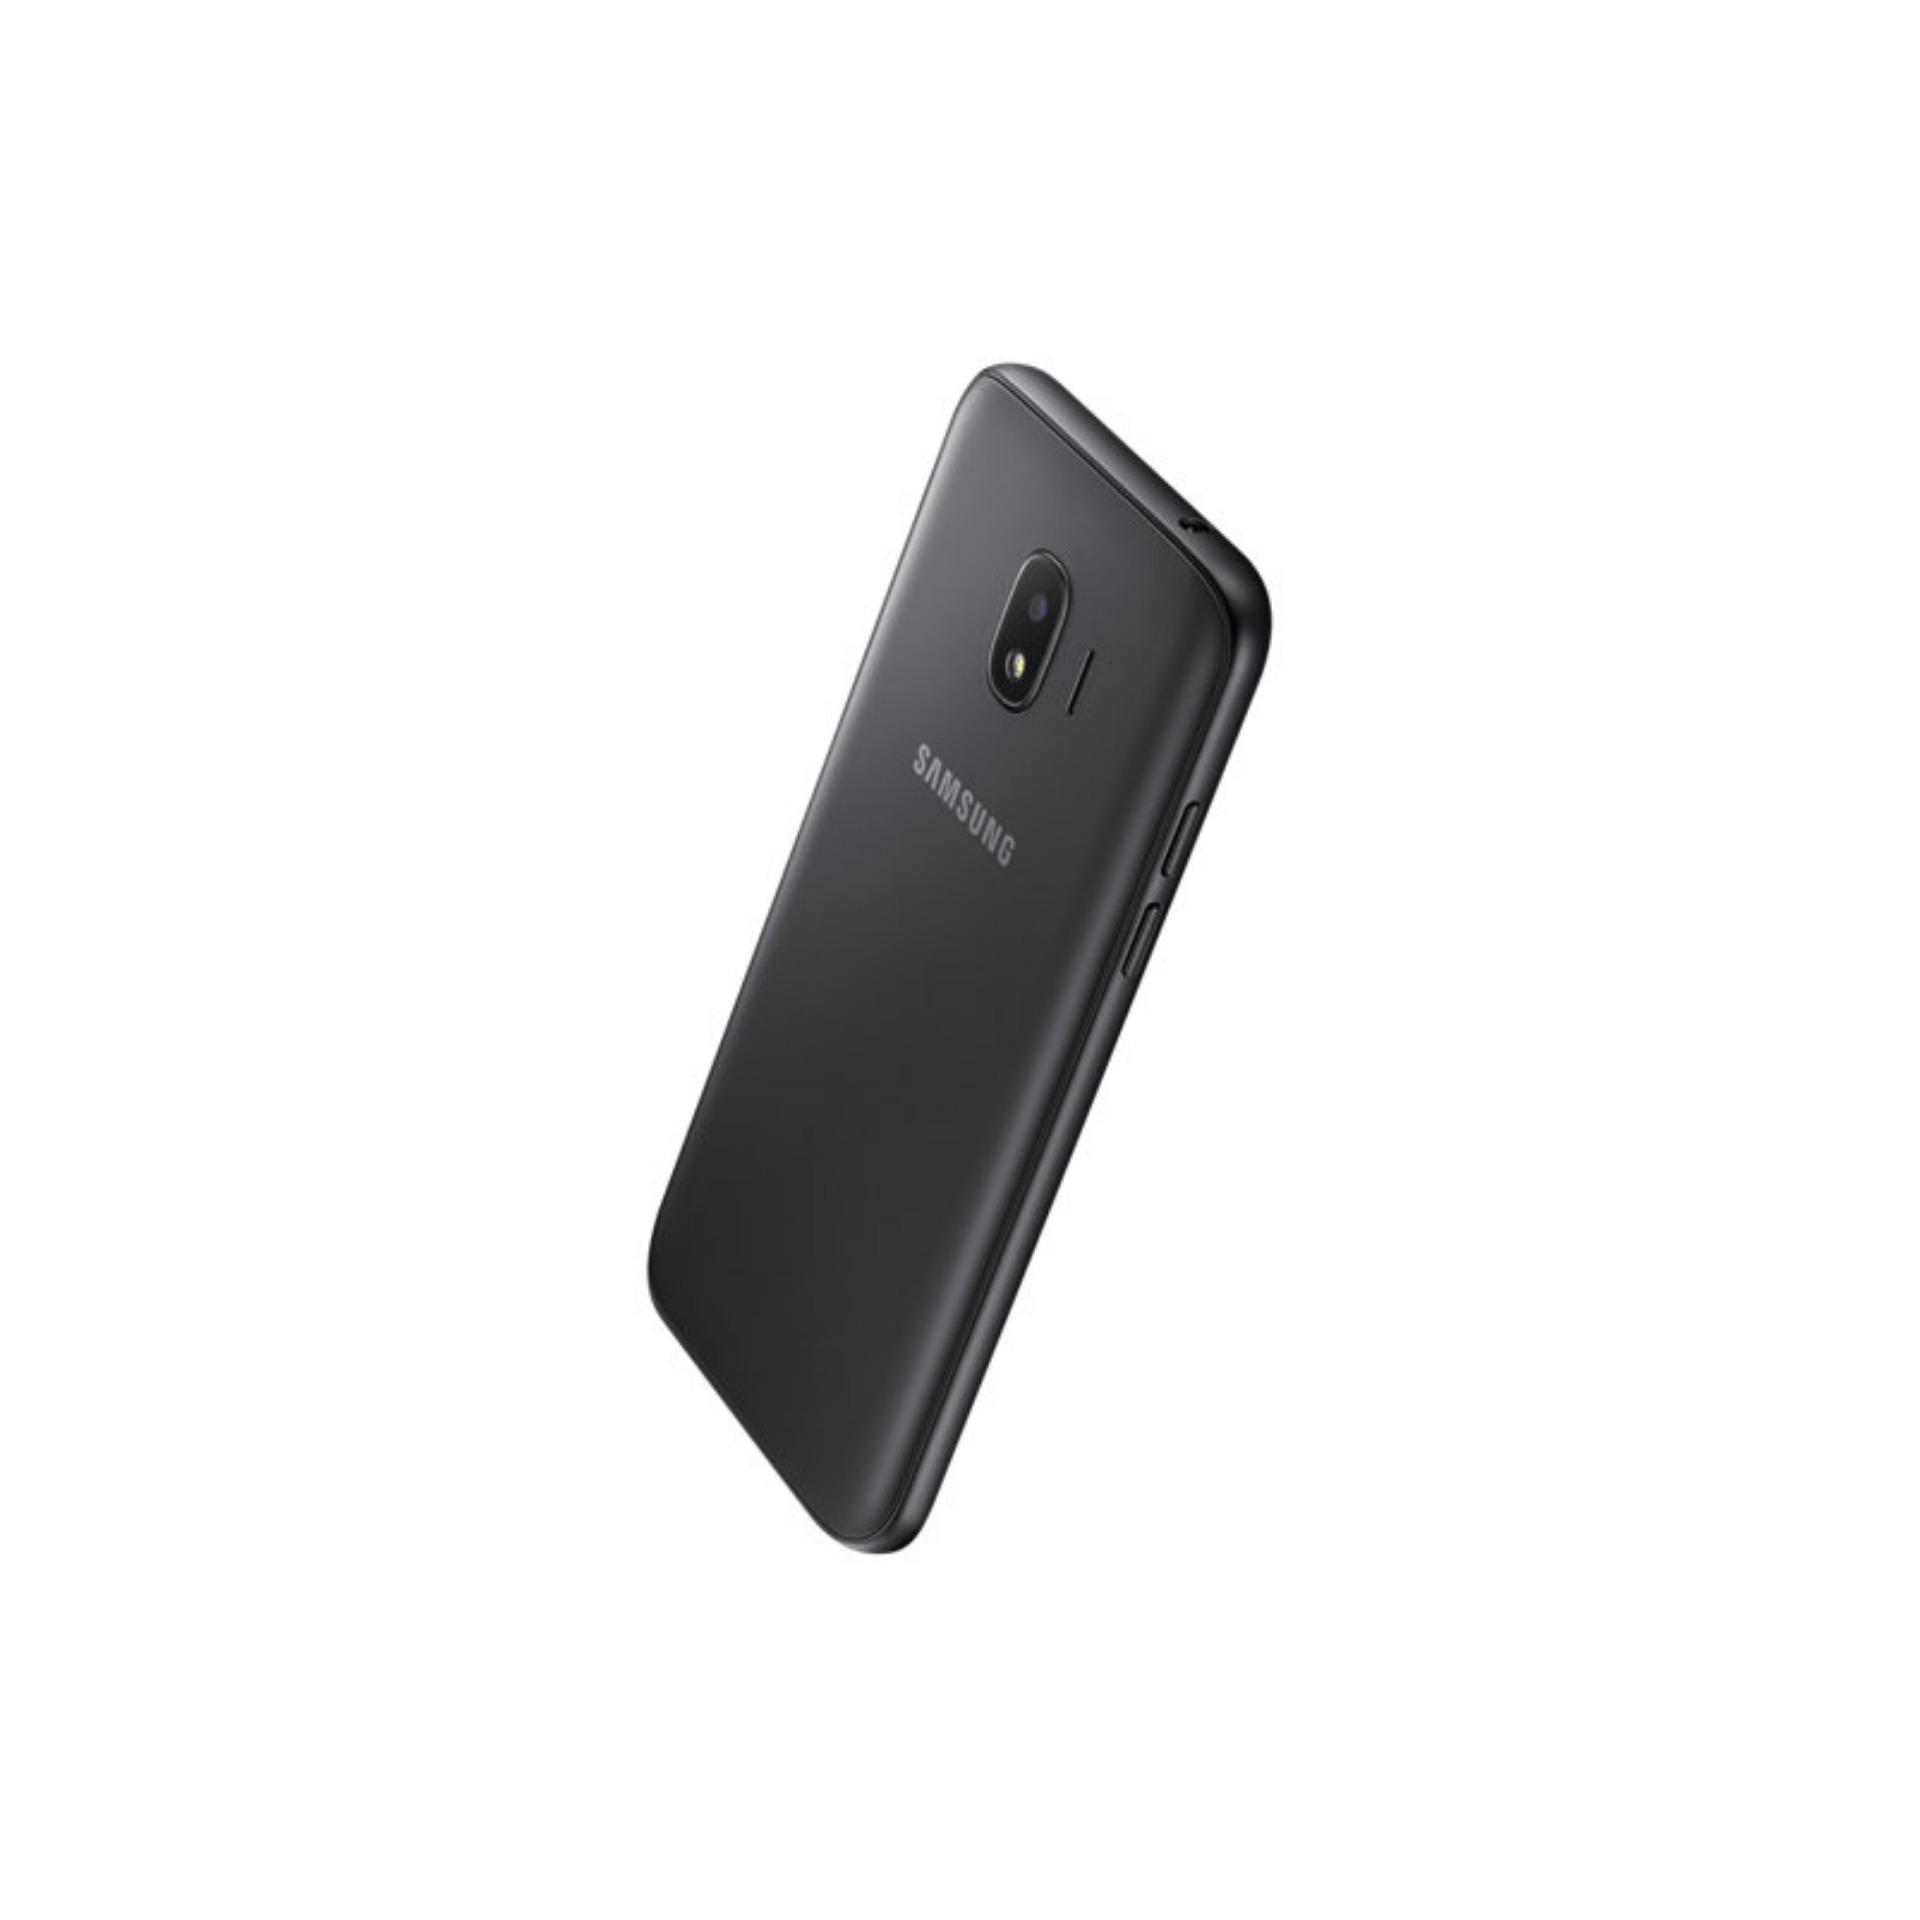 Fitur Samsung Galaxy J2 Pro Smj250 Dan Harga Terbaru Informasi